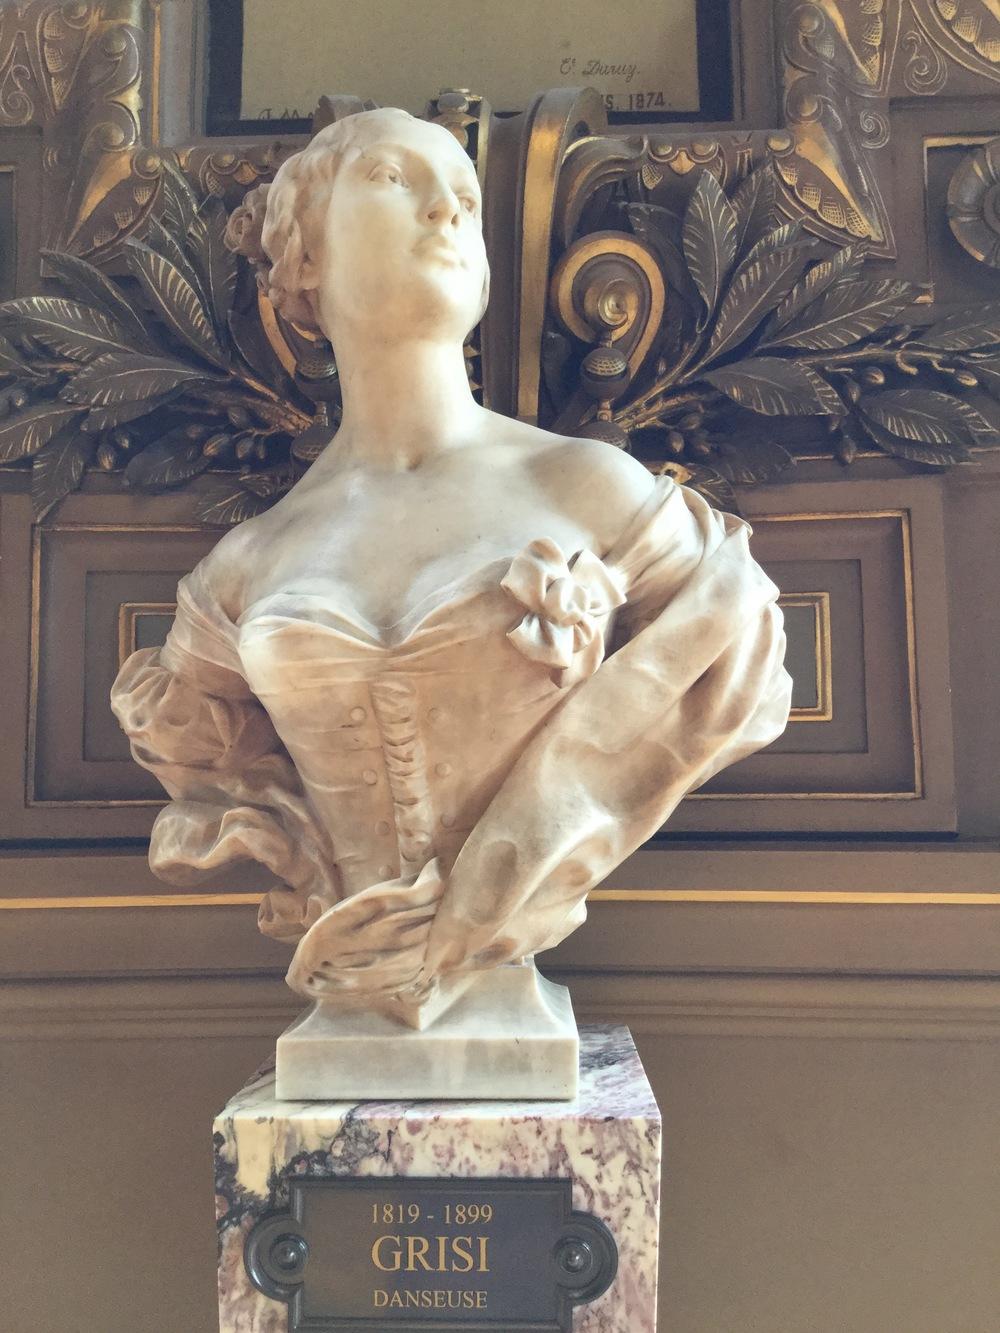 Bust of Carlotta Grisi - dancer